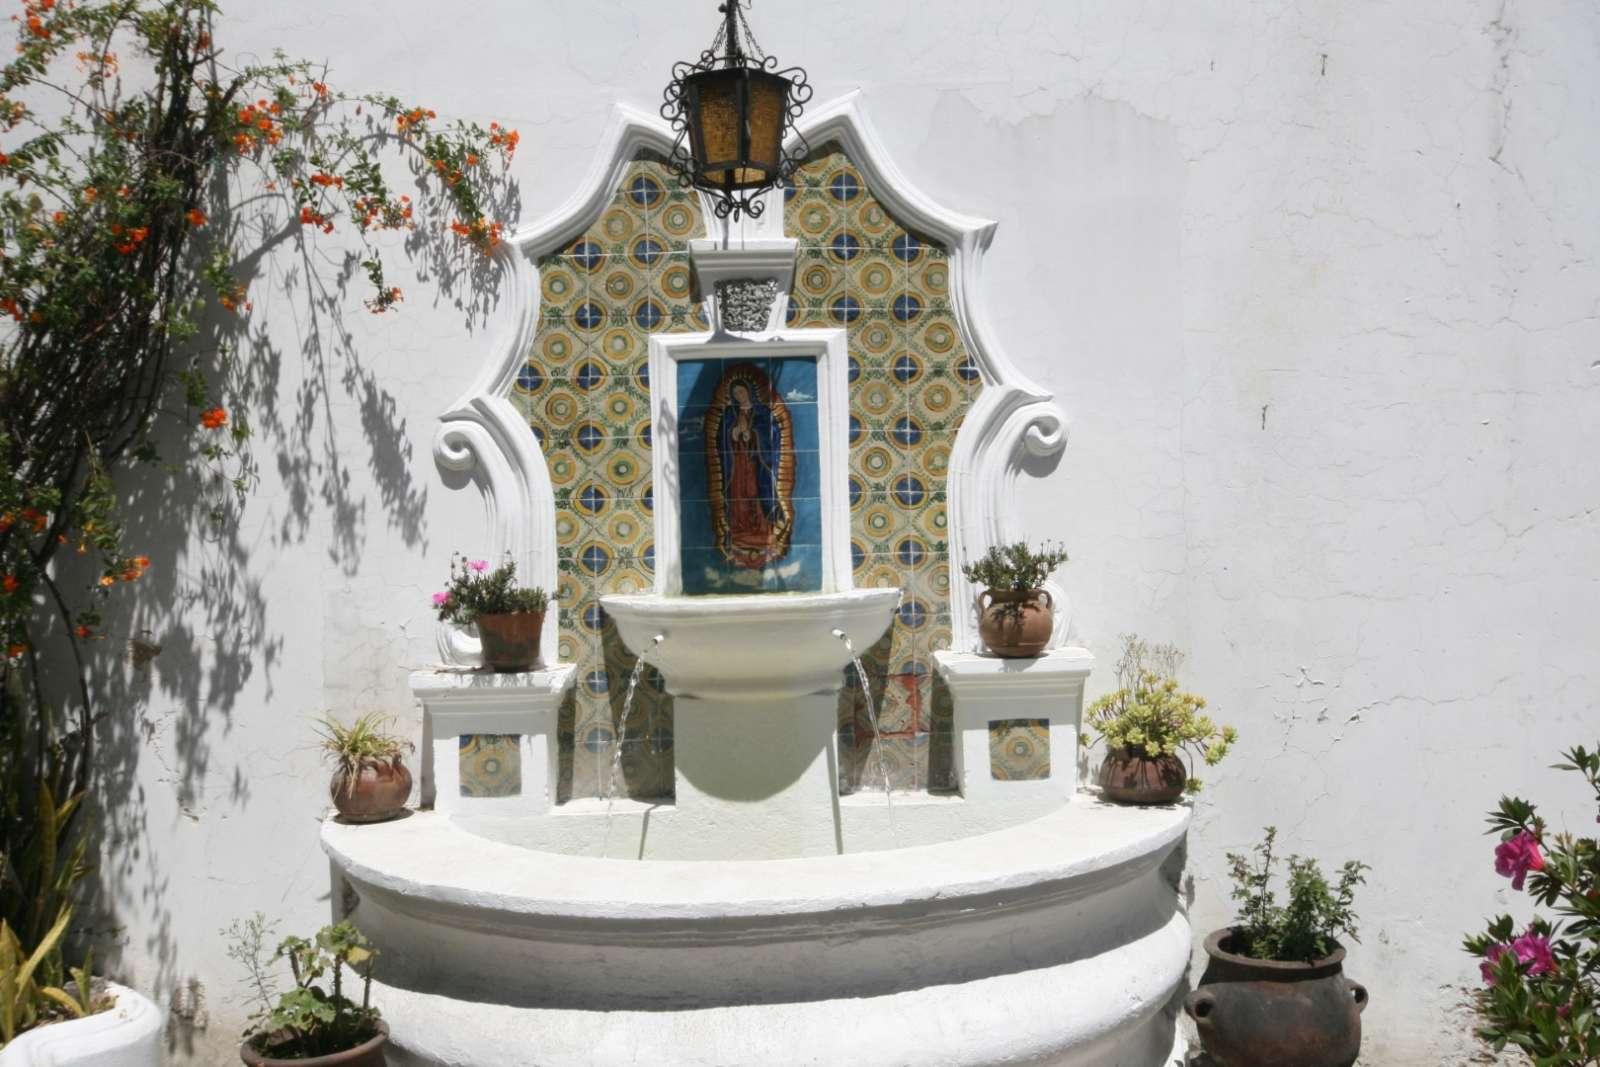 Fountain at Hotel Santo Tomas in Chichicastenango